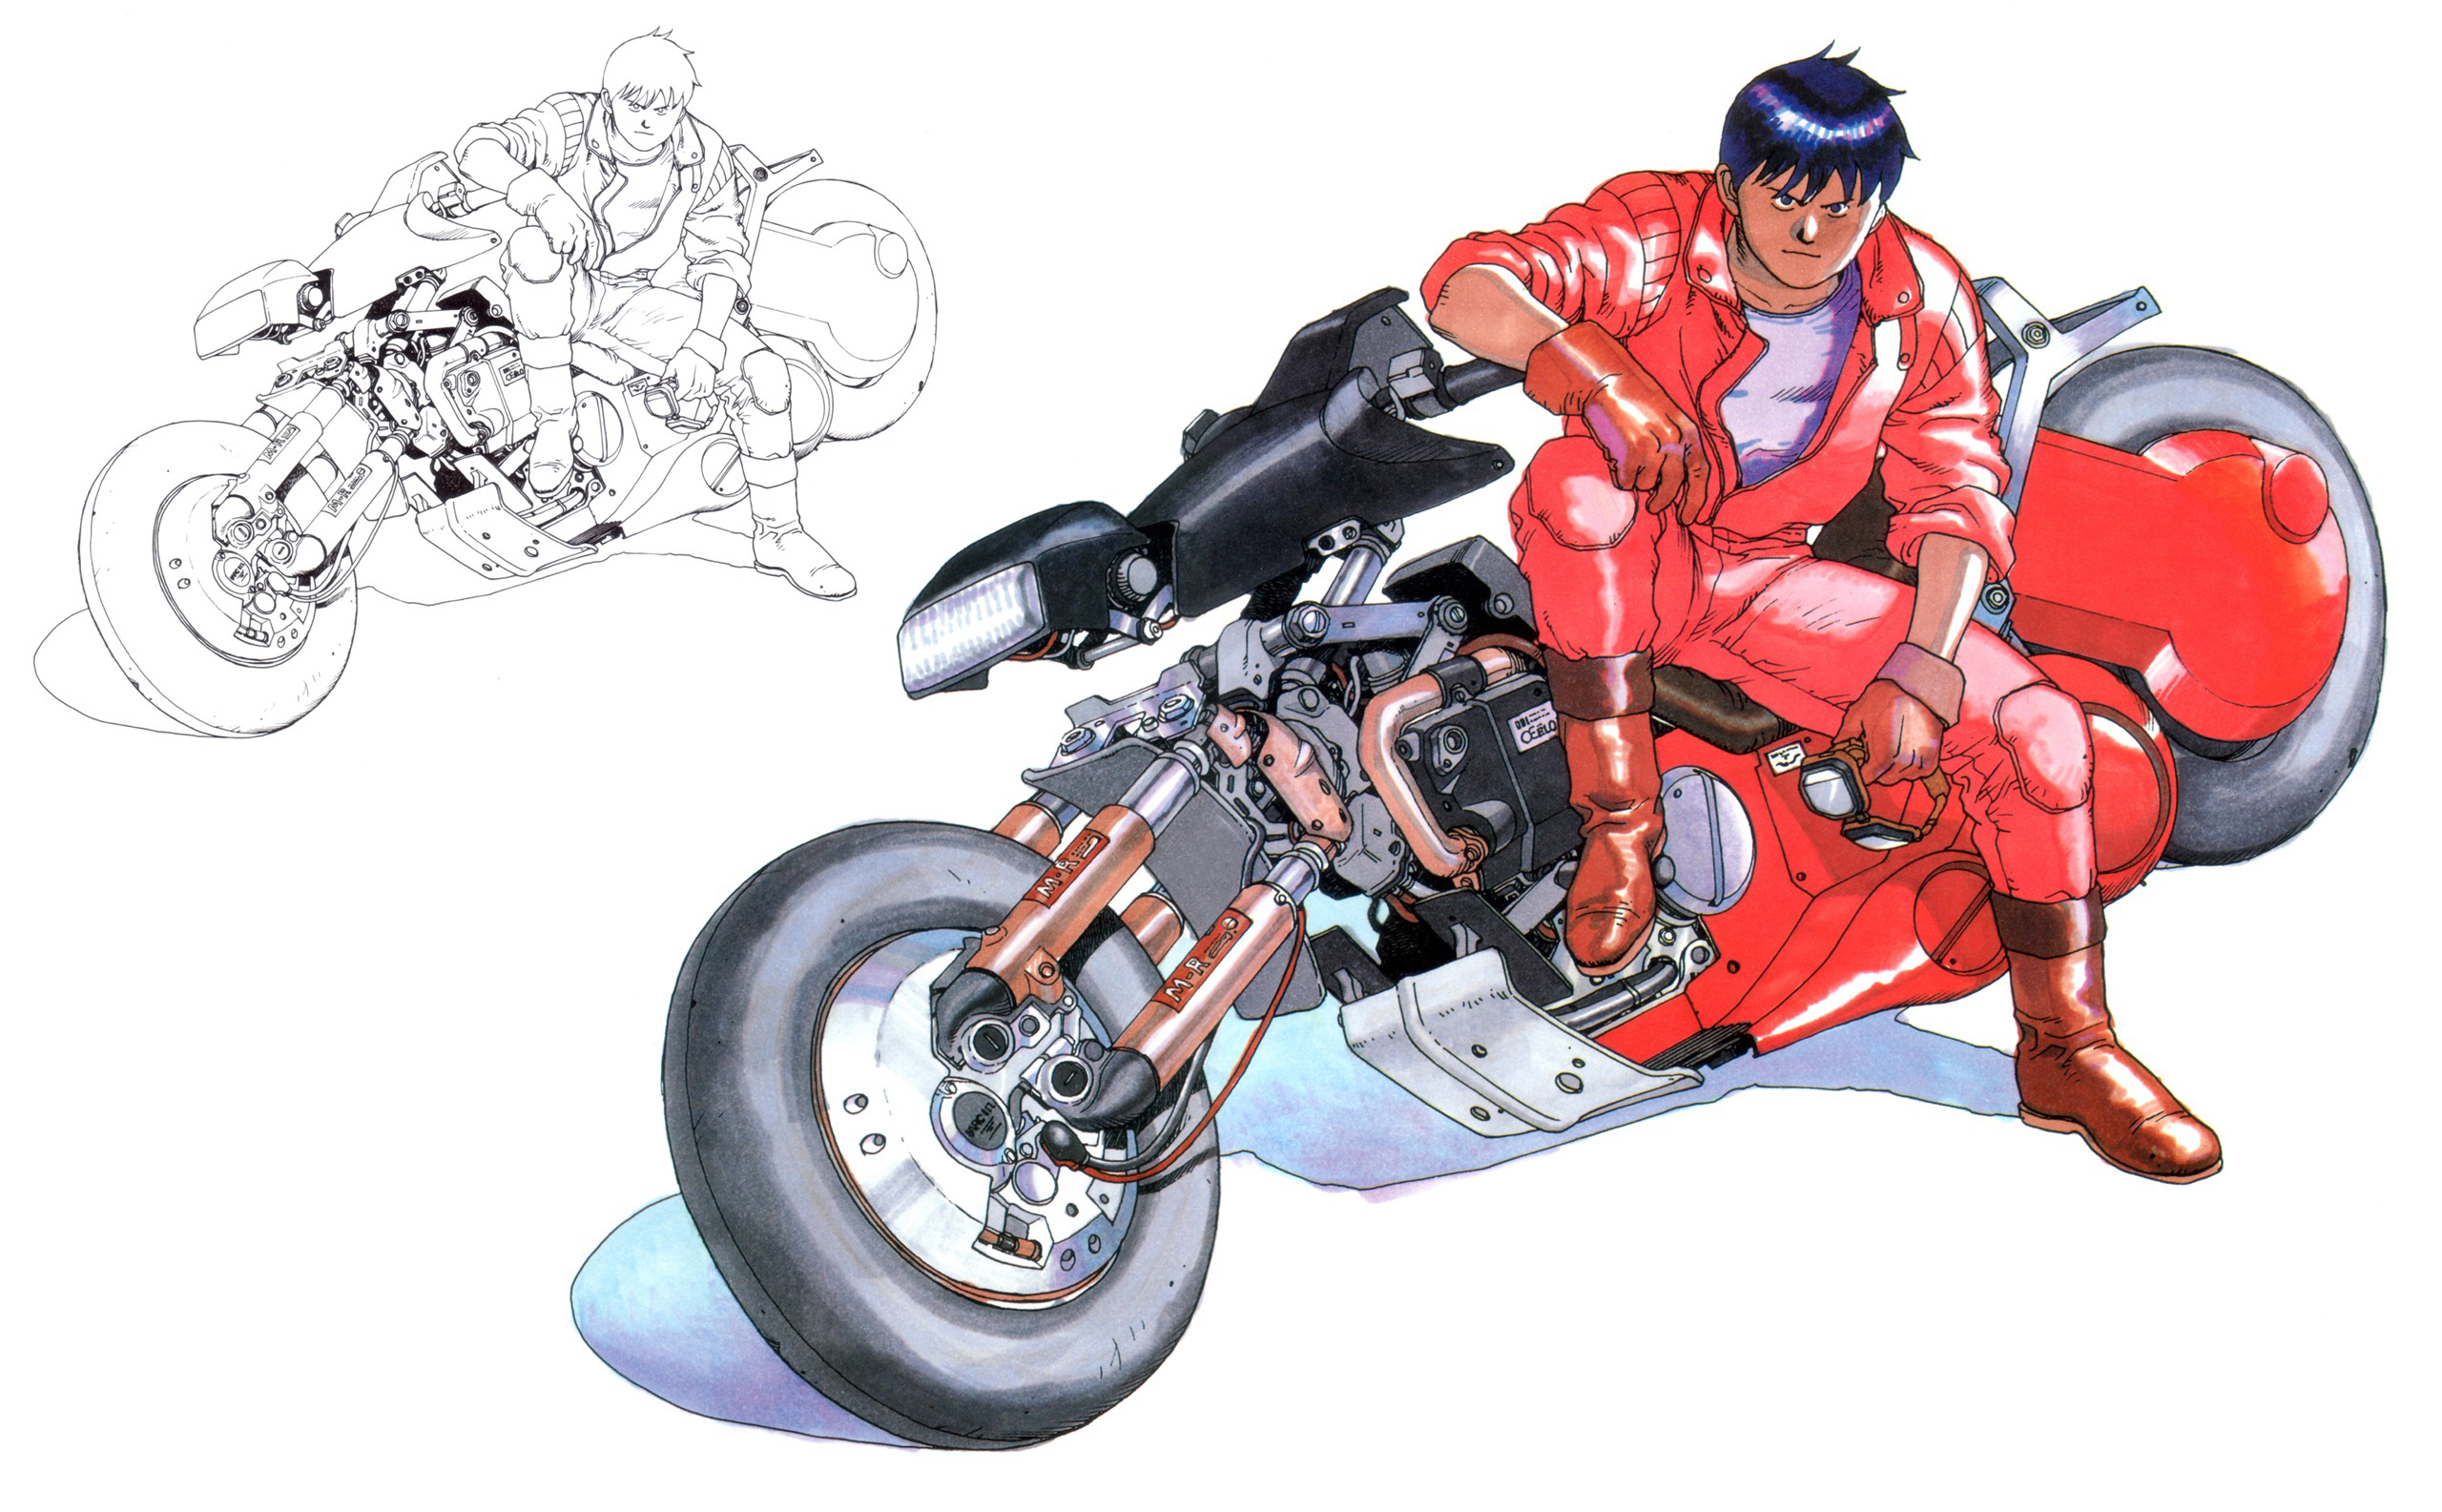 Akira Full HD Wallpaper and Background Image | 2560x1585 | ID:16916